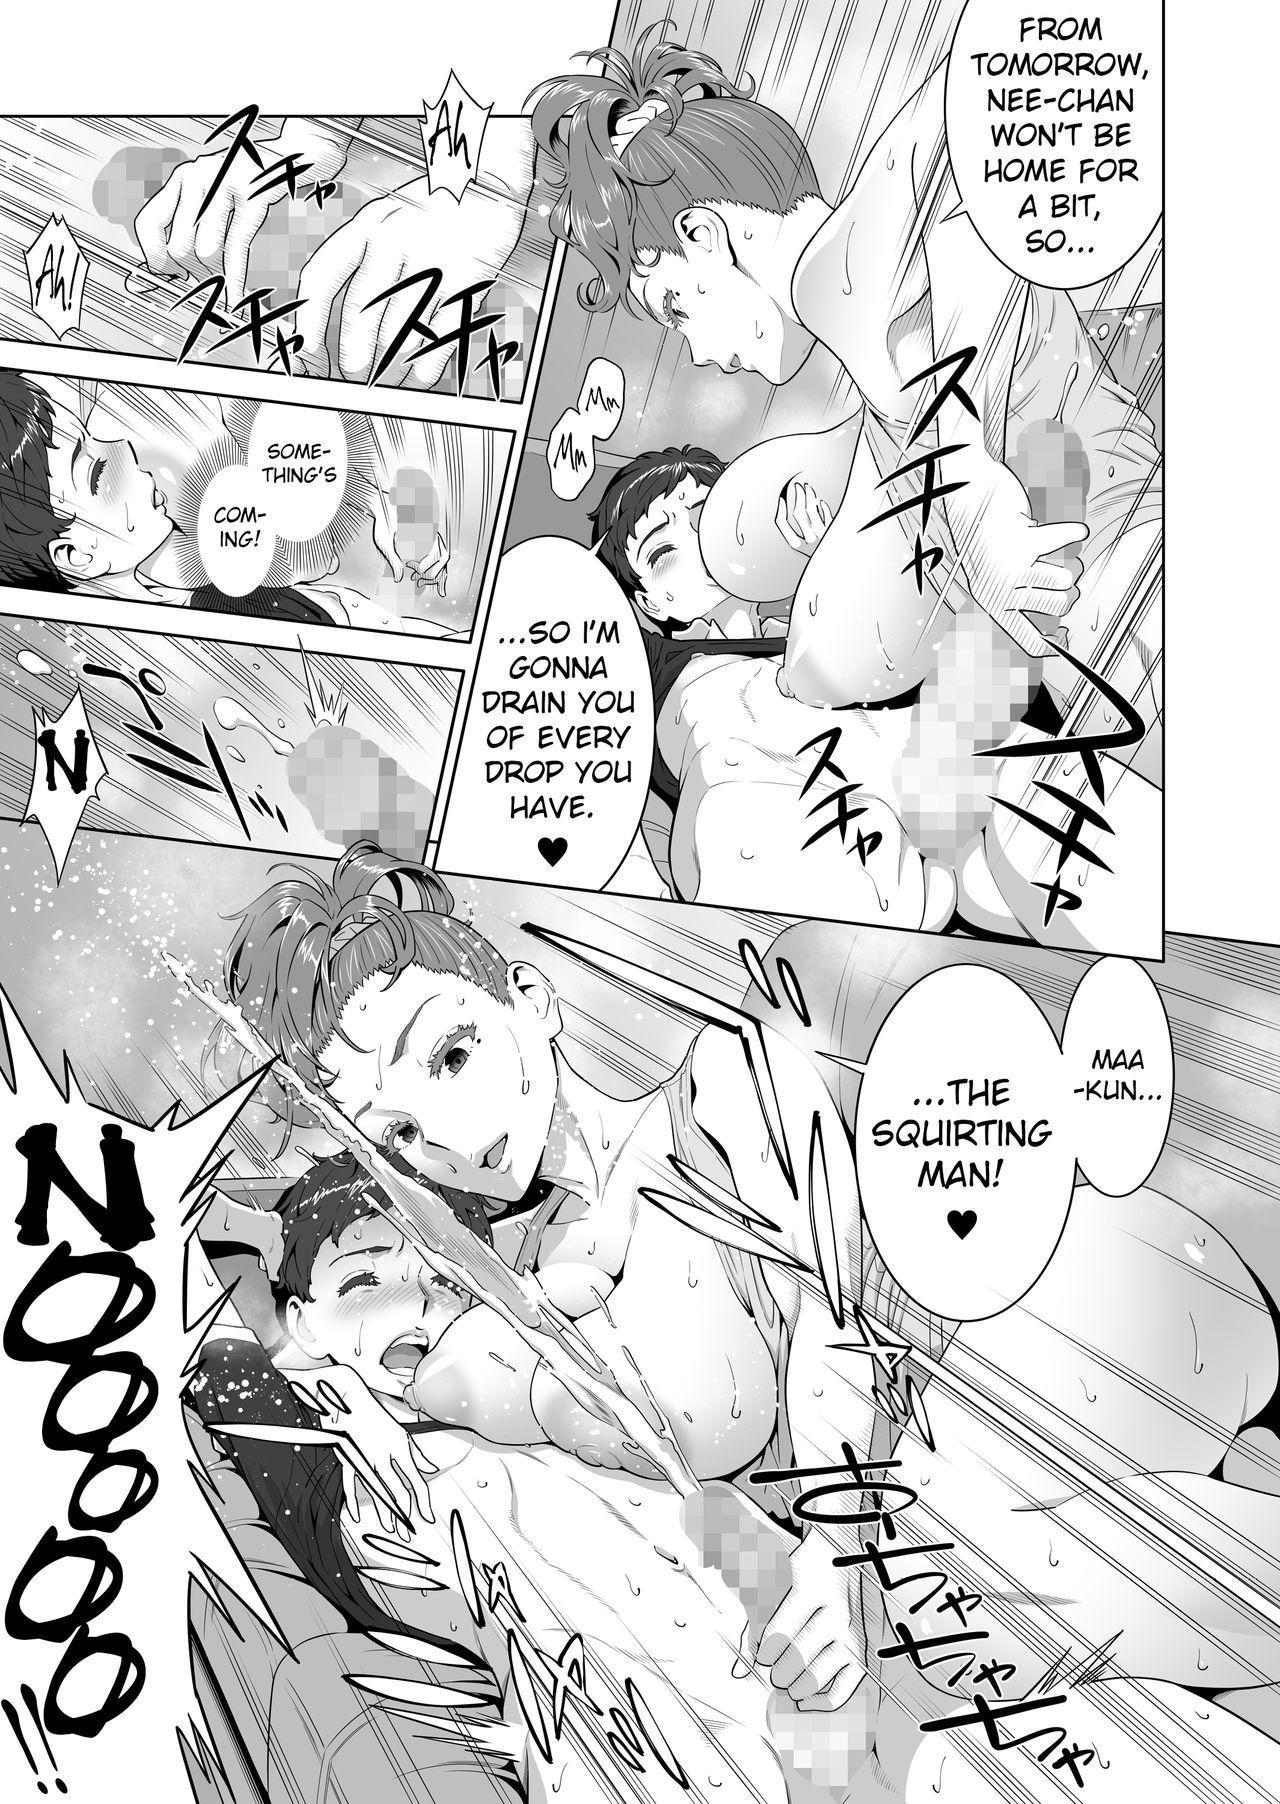 [RED Paprika (Aka P)] Ayu-nee Kocchi Muite   Ayu-nee look this way [English] [AnotsuSagami] 26